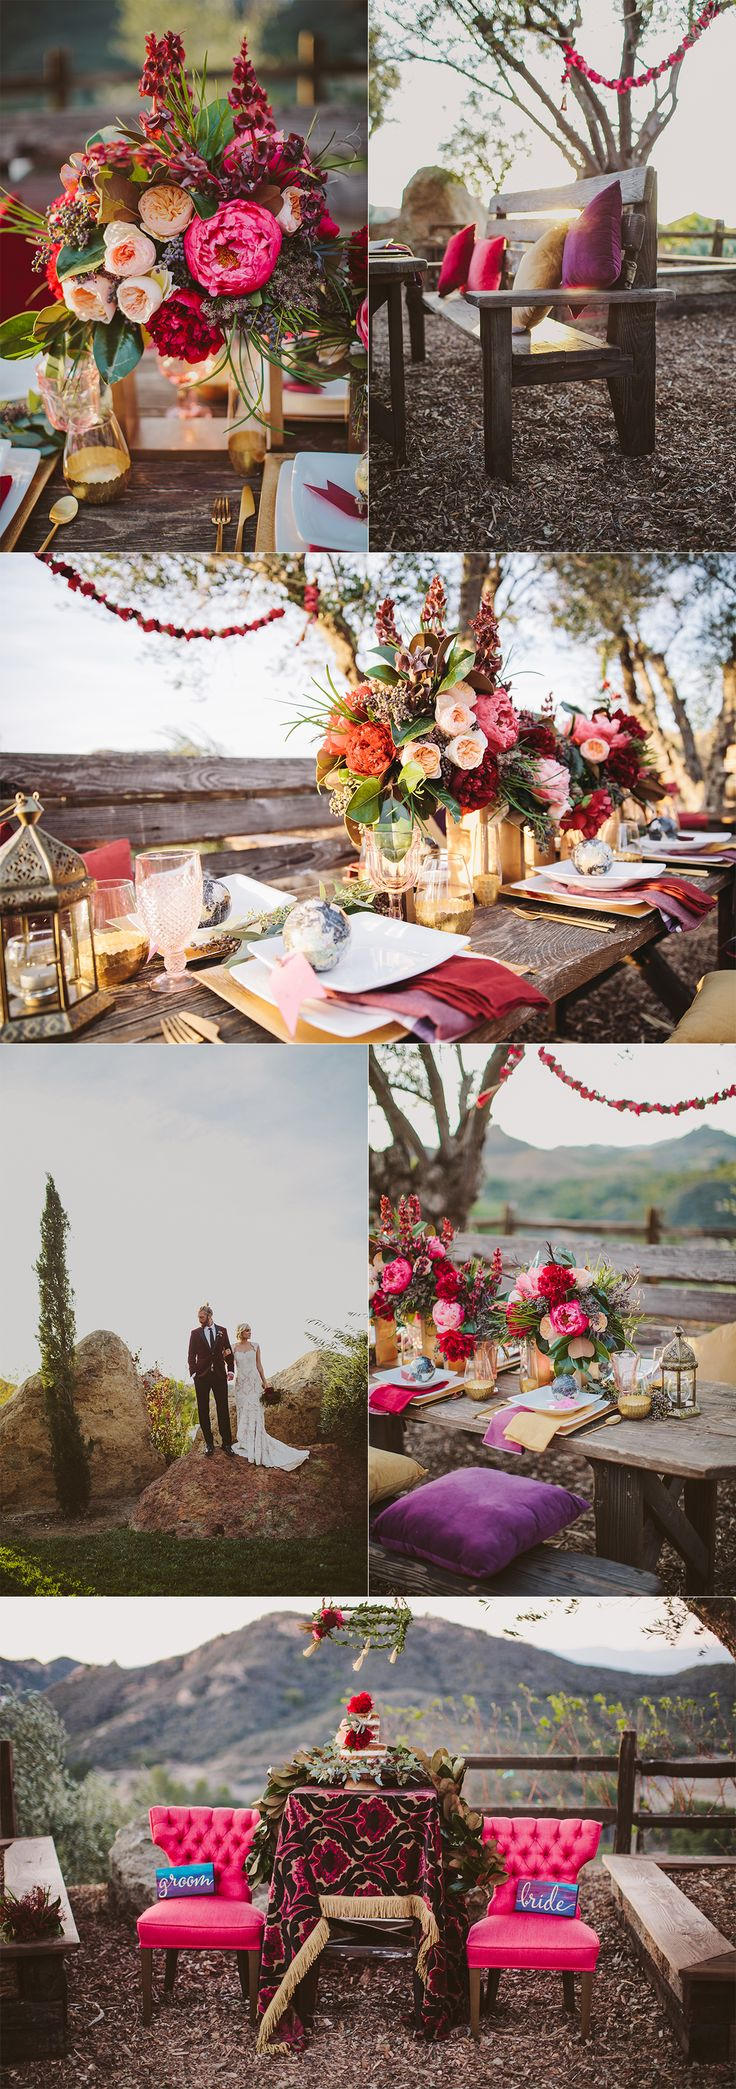 A Whimiscal Bohemian Wedding At Cielo Farms Venue In Malibu